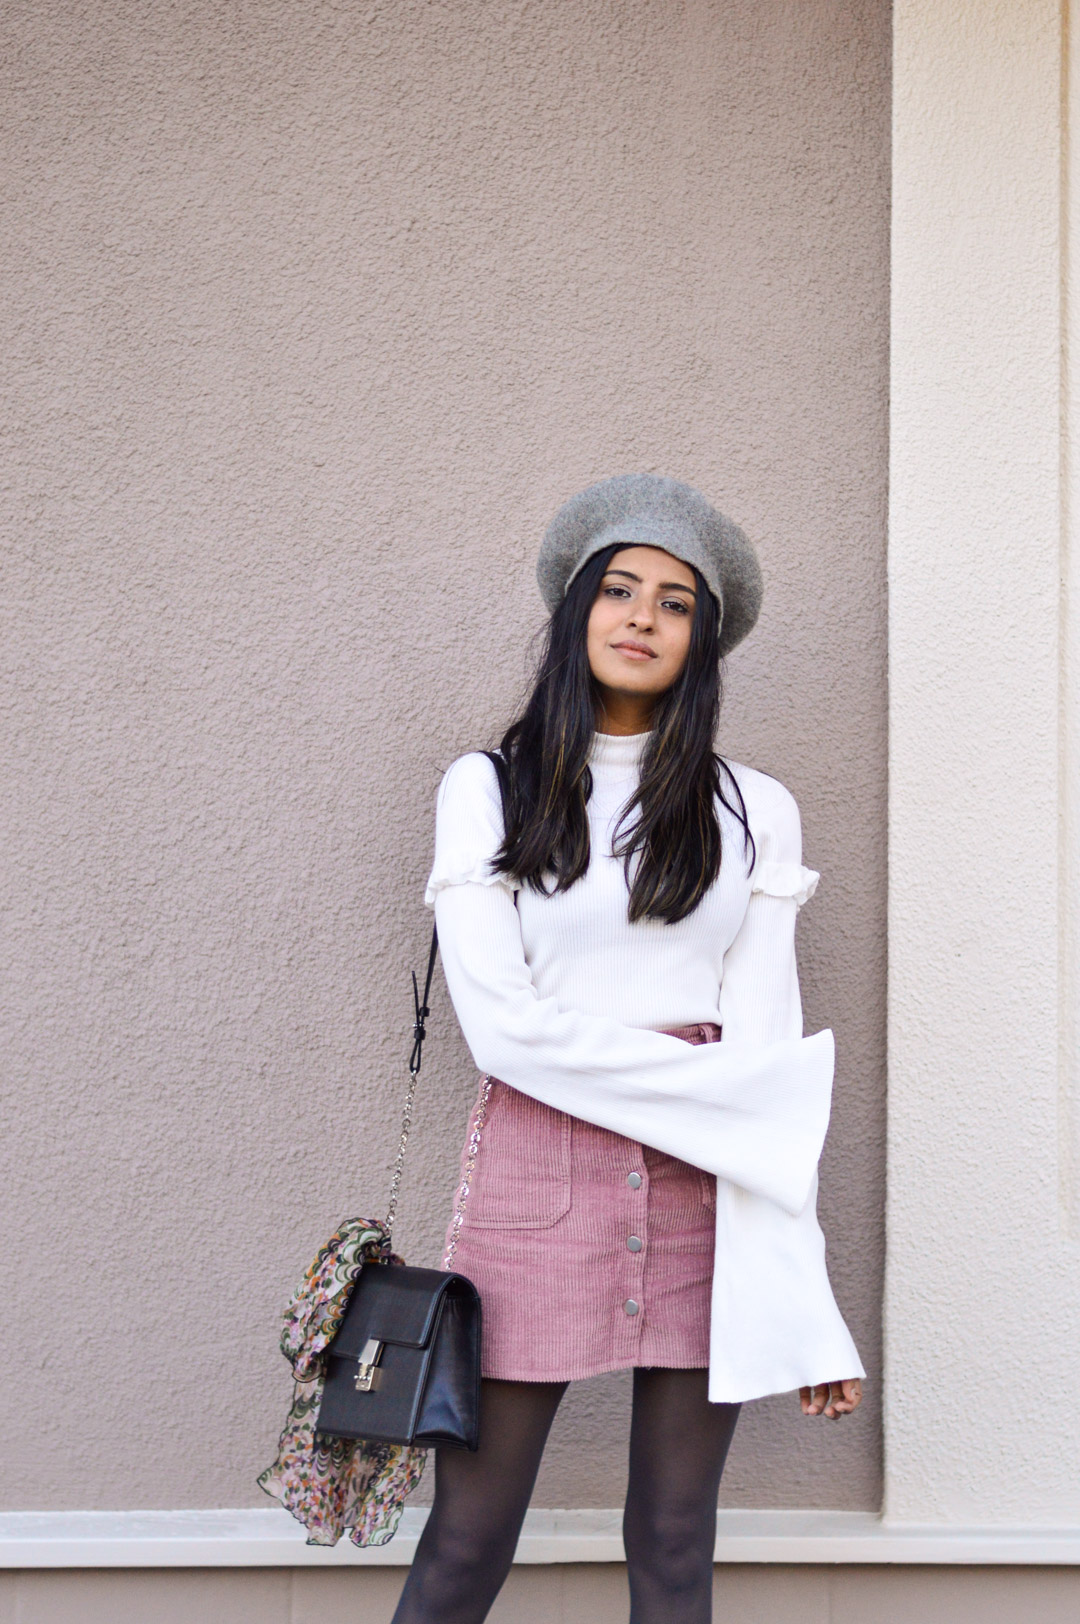 corduroy-skirt-bell-sleeves-beret-fall-fashion 8